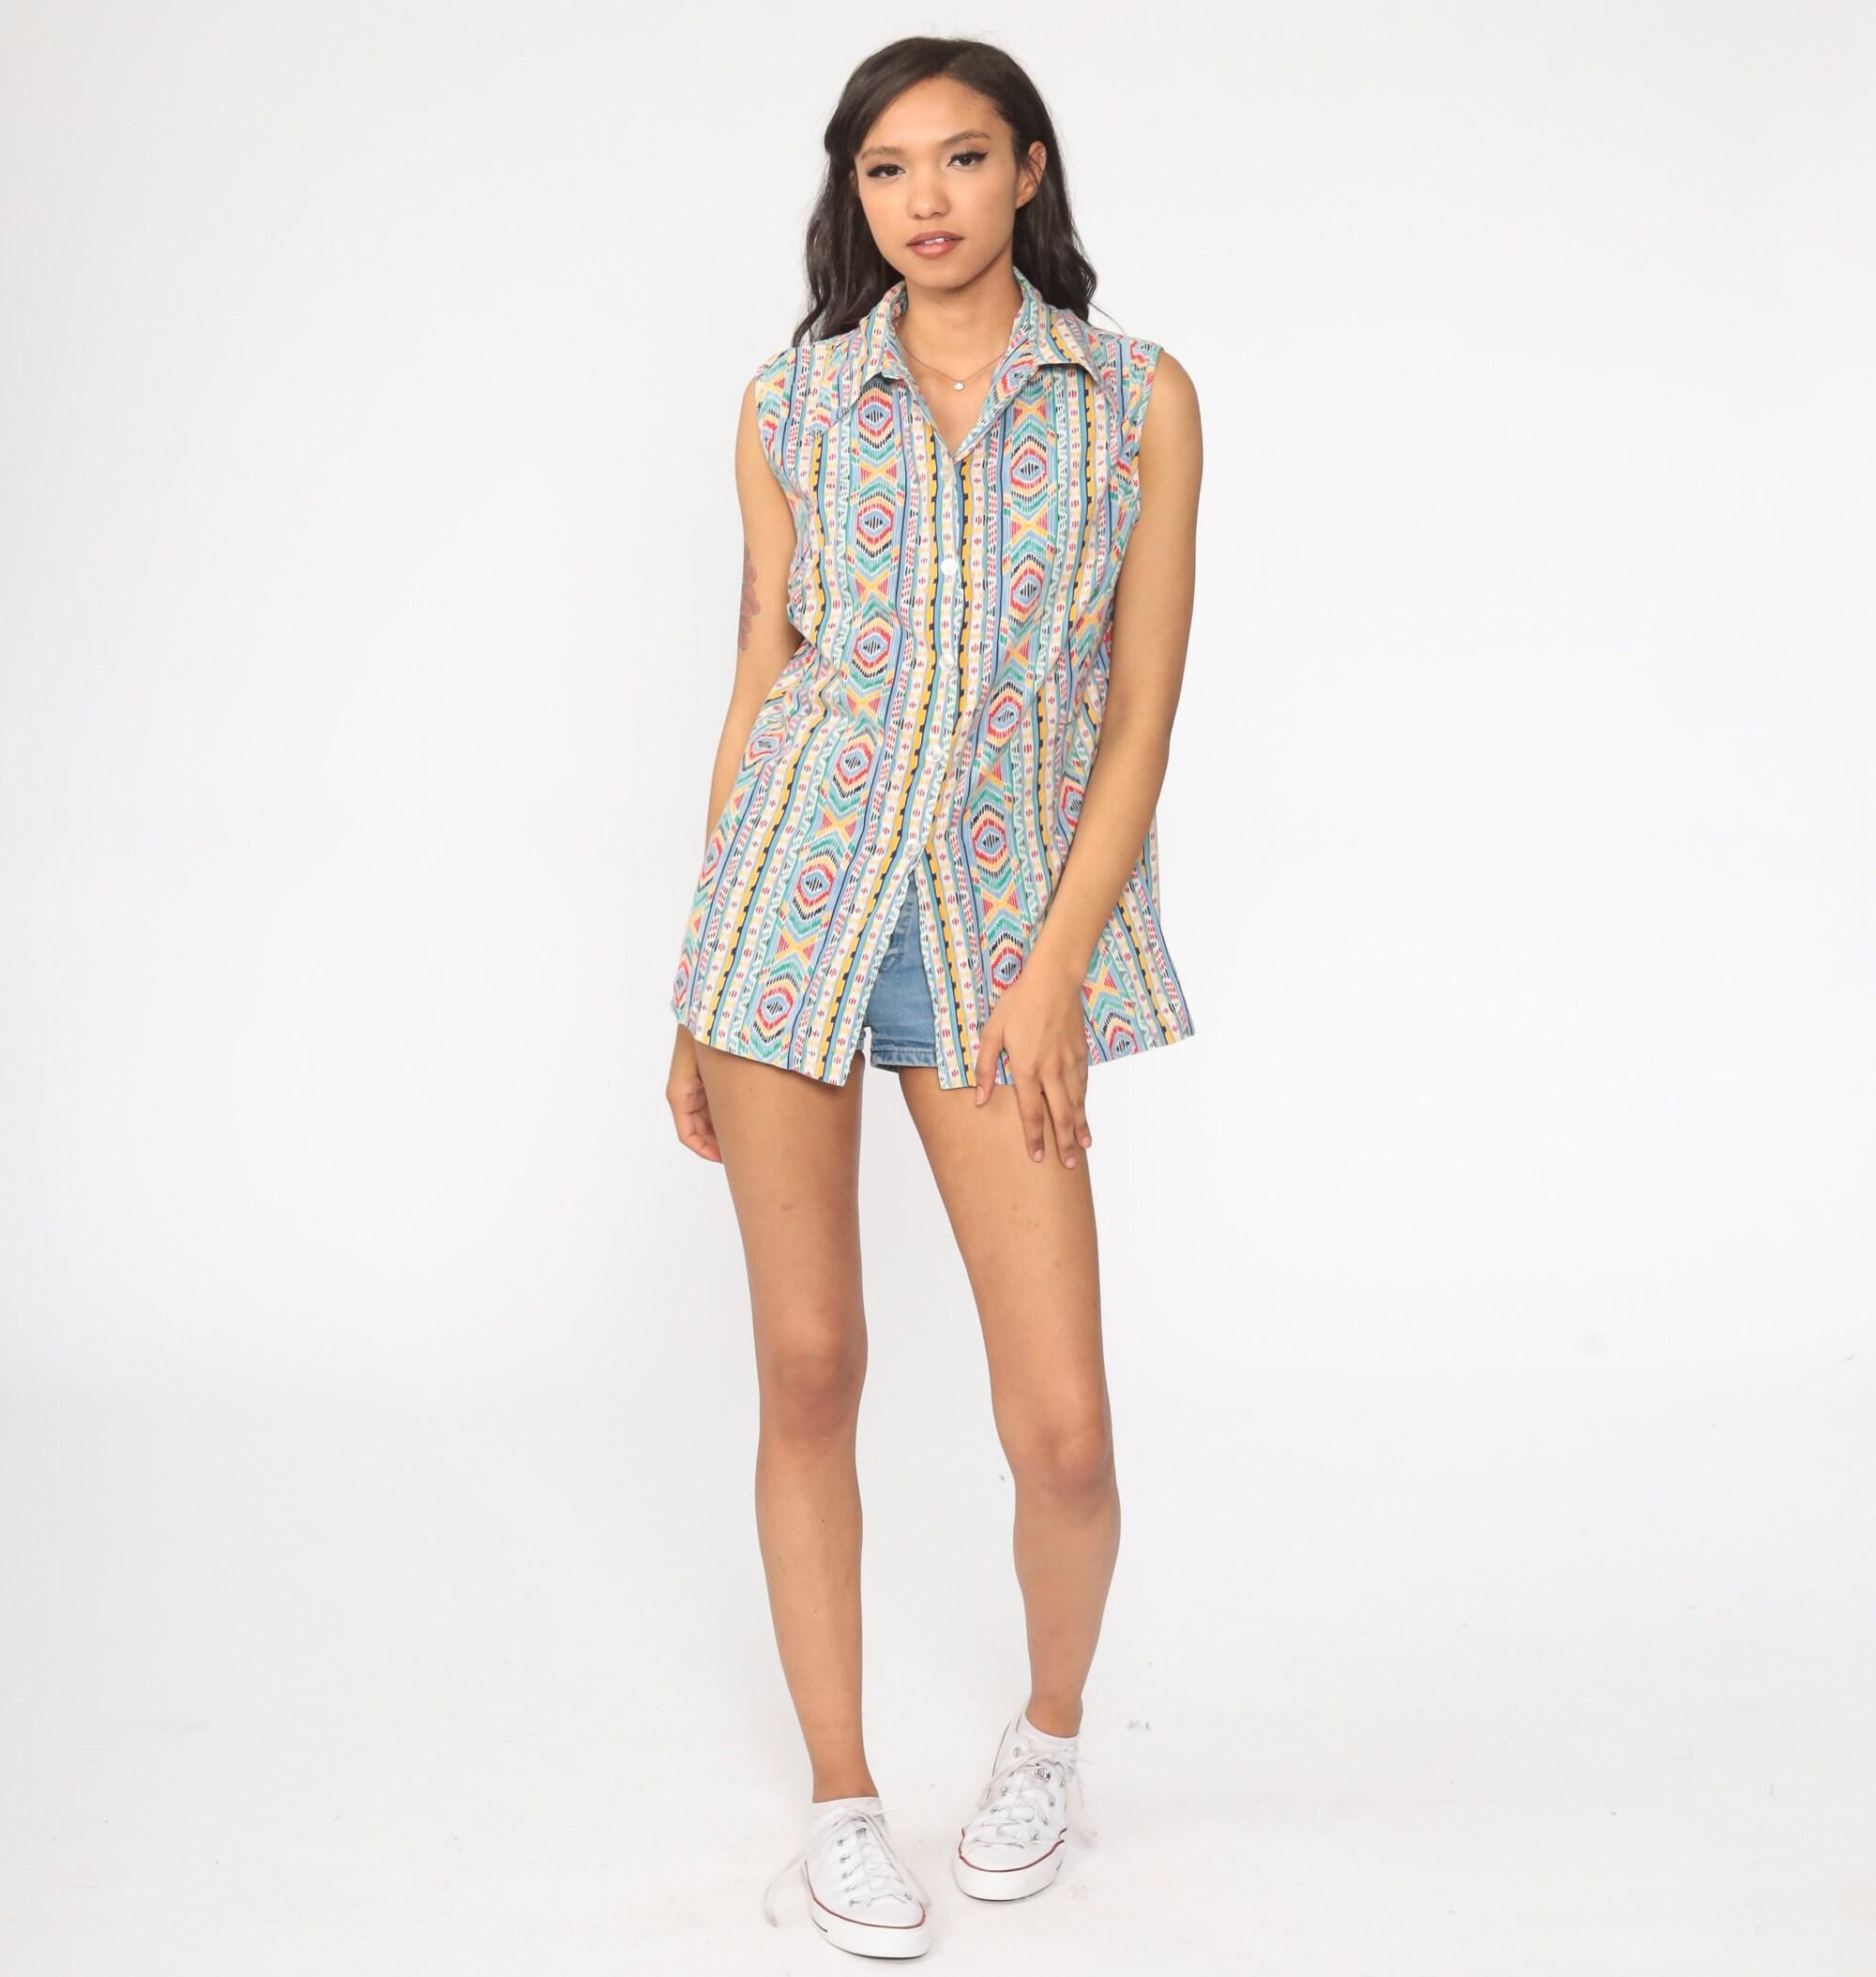 Tribal Top Aztec Shirt Geometric Blouse 70s Top Bohemian Shirt 1970s Hippie Sleeveless Button Up Boho Tank Top Retro Stripe large